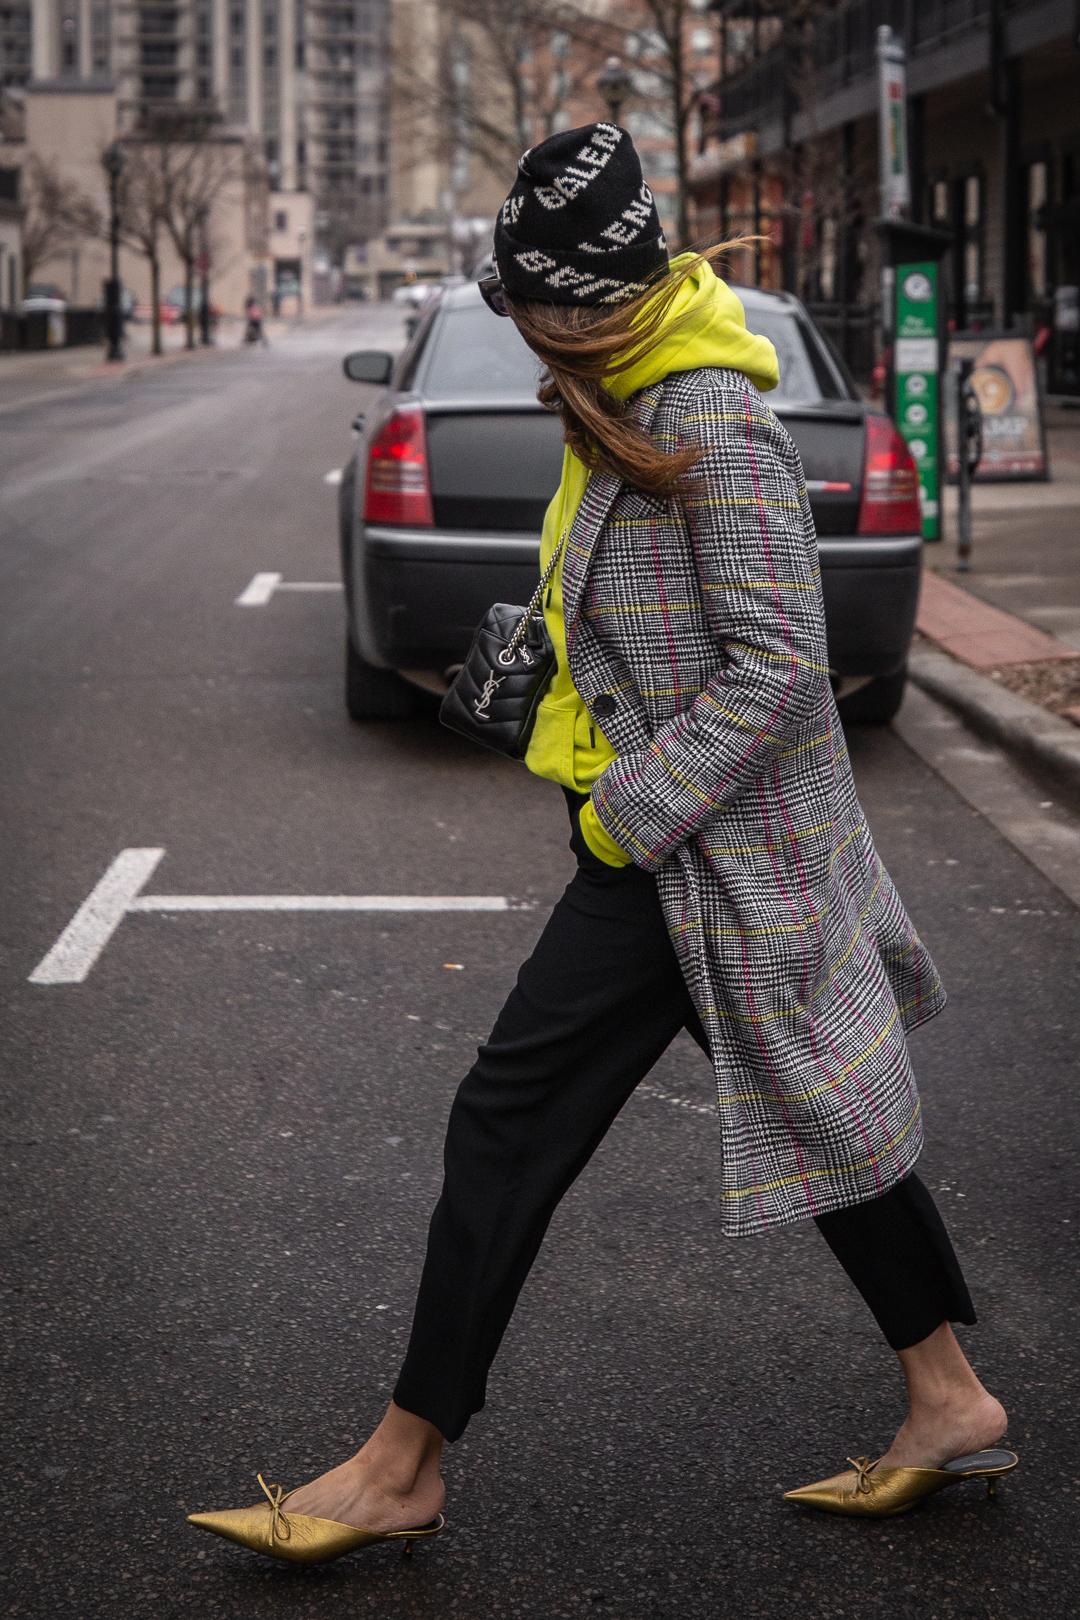 Nathalie Martin - Balenciaga logo beanie hat, Saint Laurent LouLou small bowling bag, Zara neon yellow hoodie, Aritzia Jallade black high waisted pant, Balenciaga bronze leather Knife mules, Dior club 2 sunglasses, street style - WOAHSTYLE.com_5313.jpg